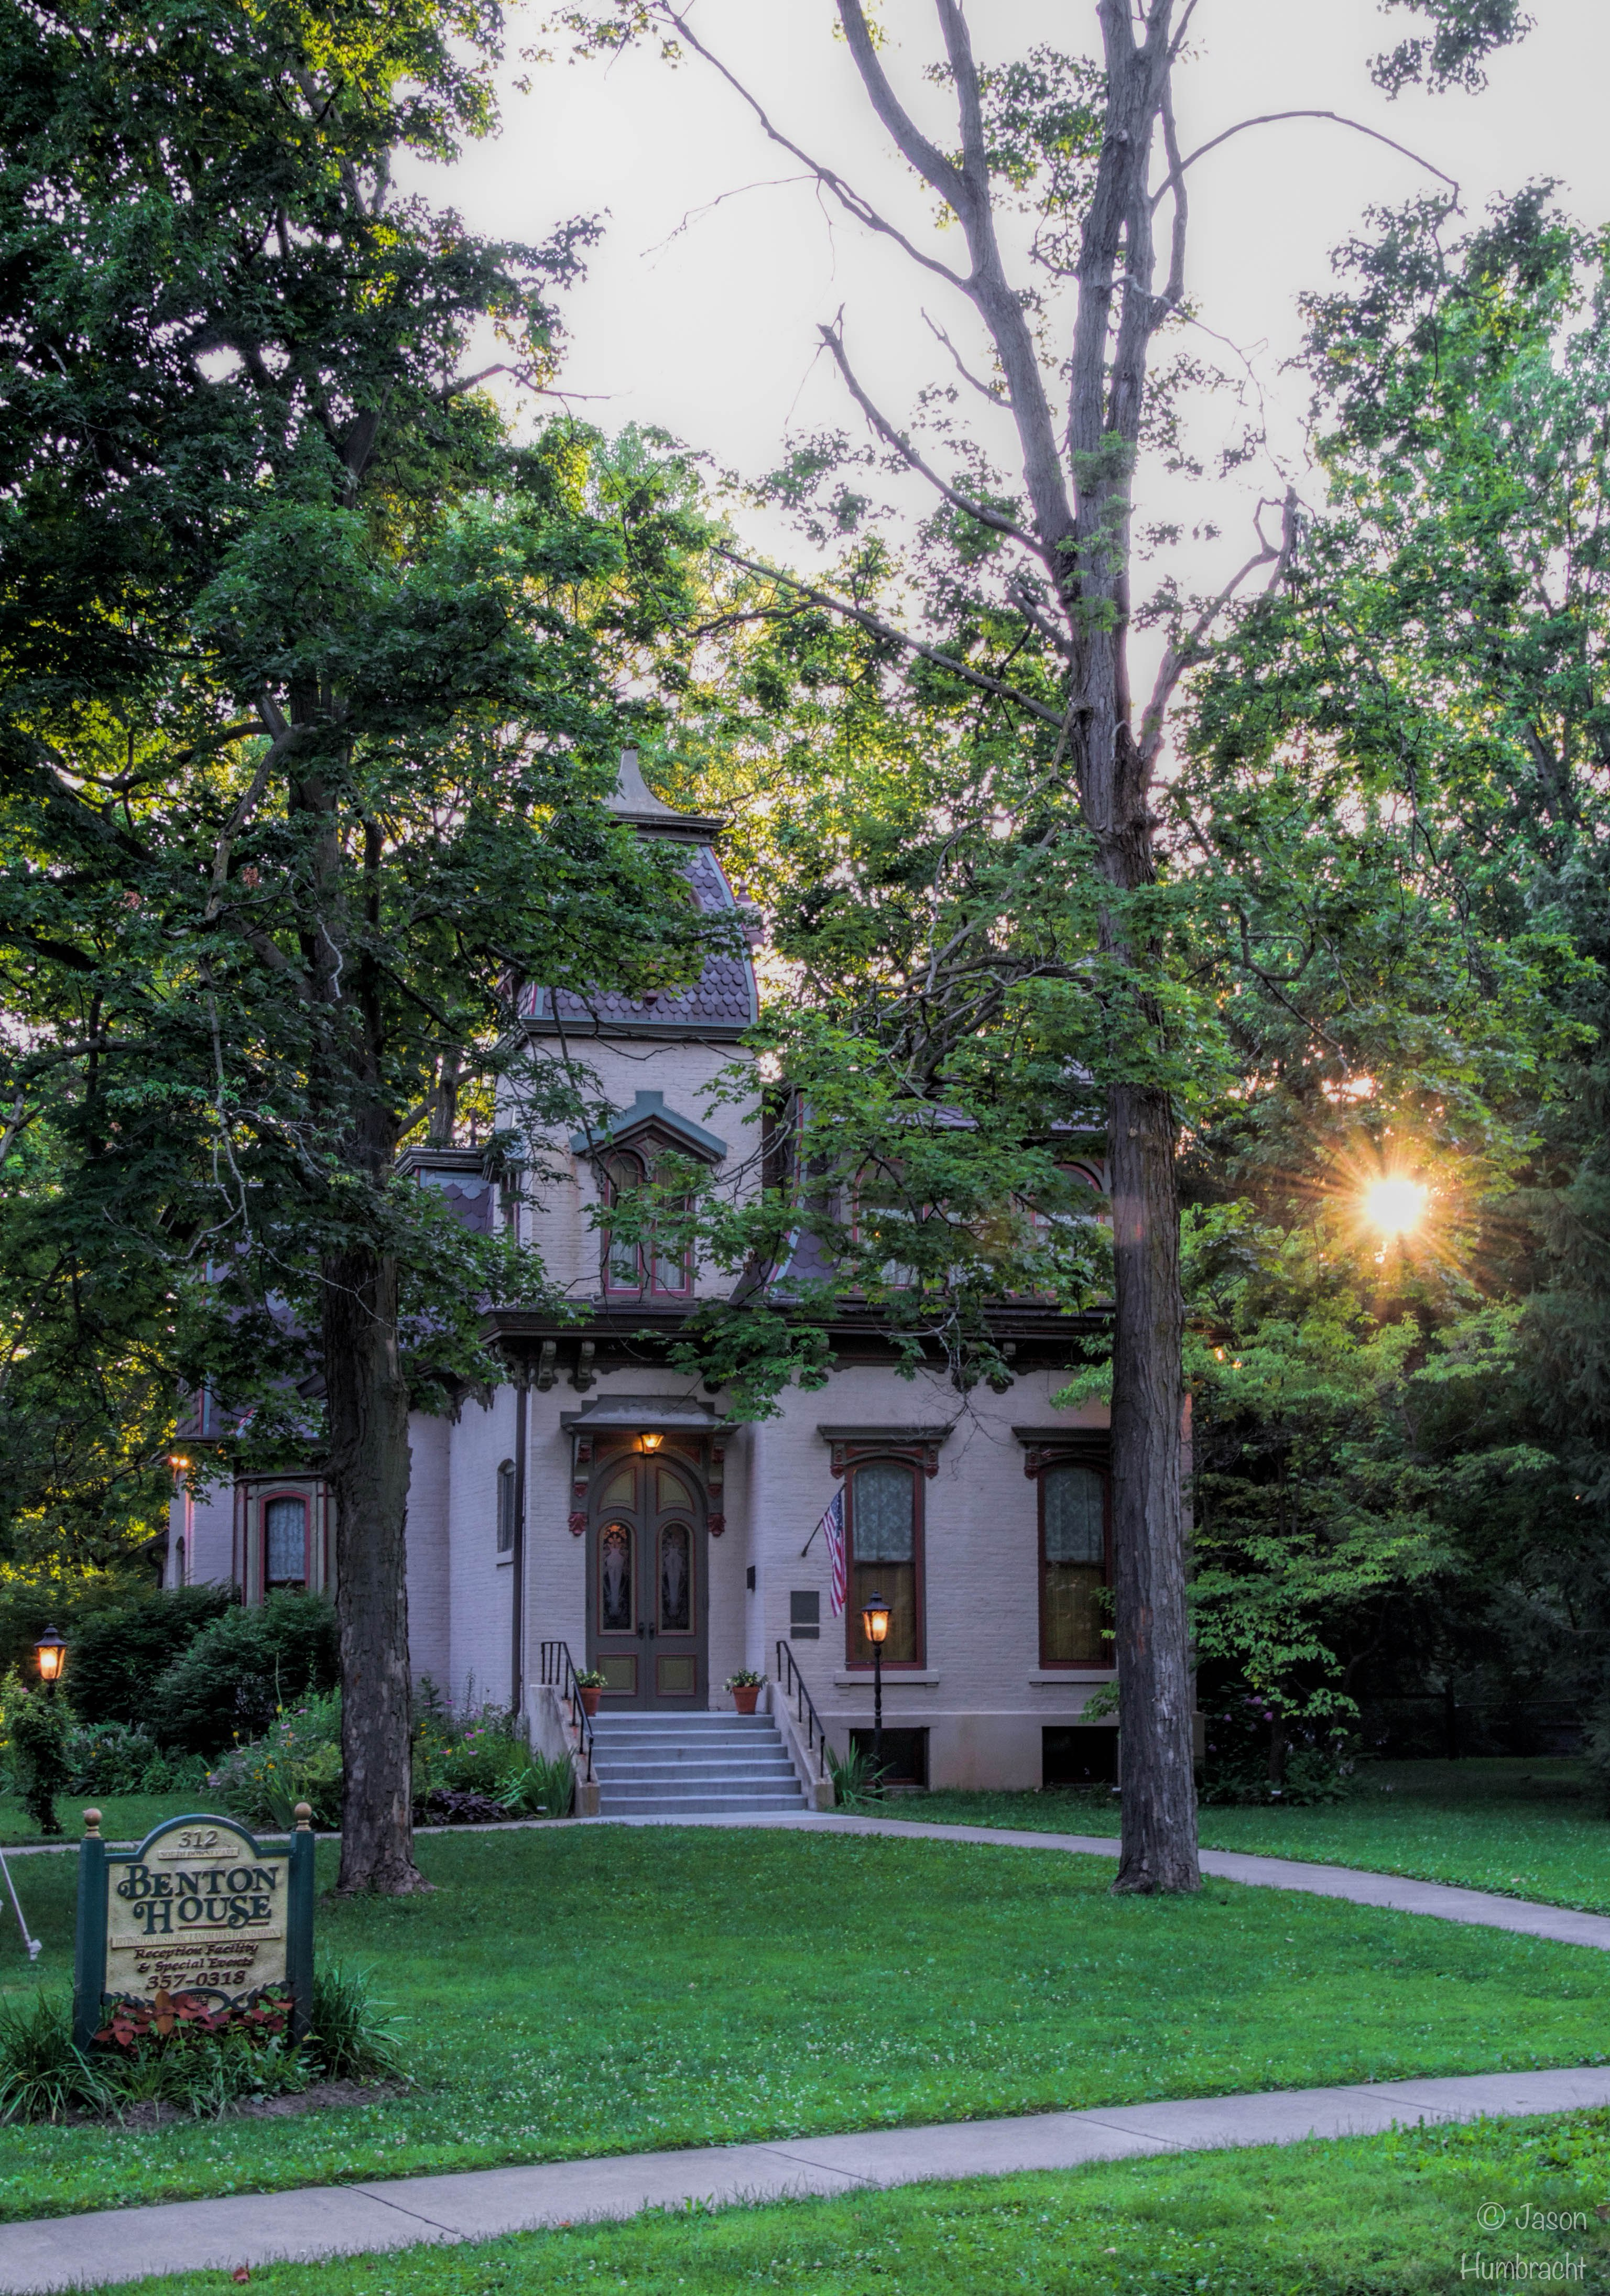 The sun sets behind the 1873 Benton House.